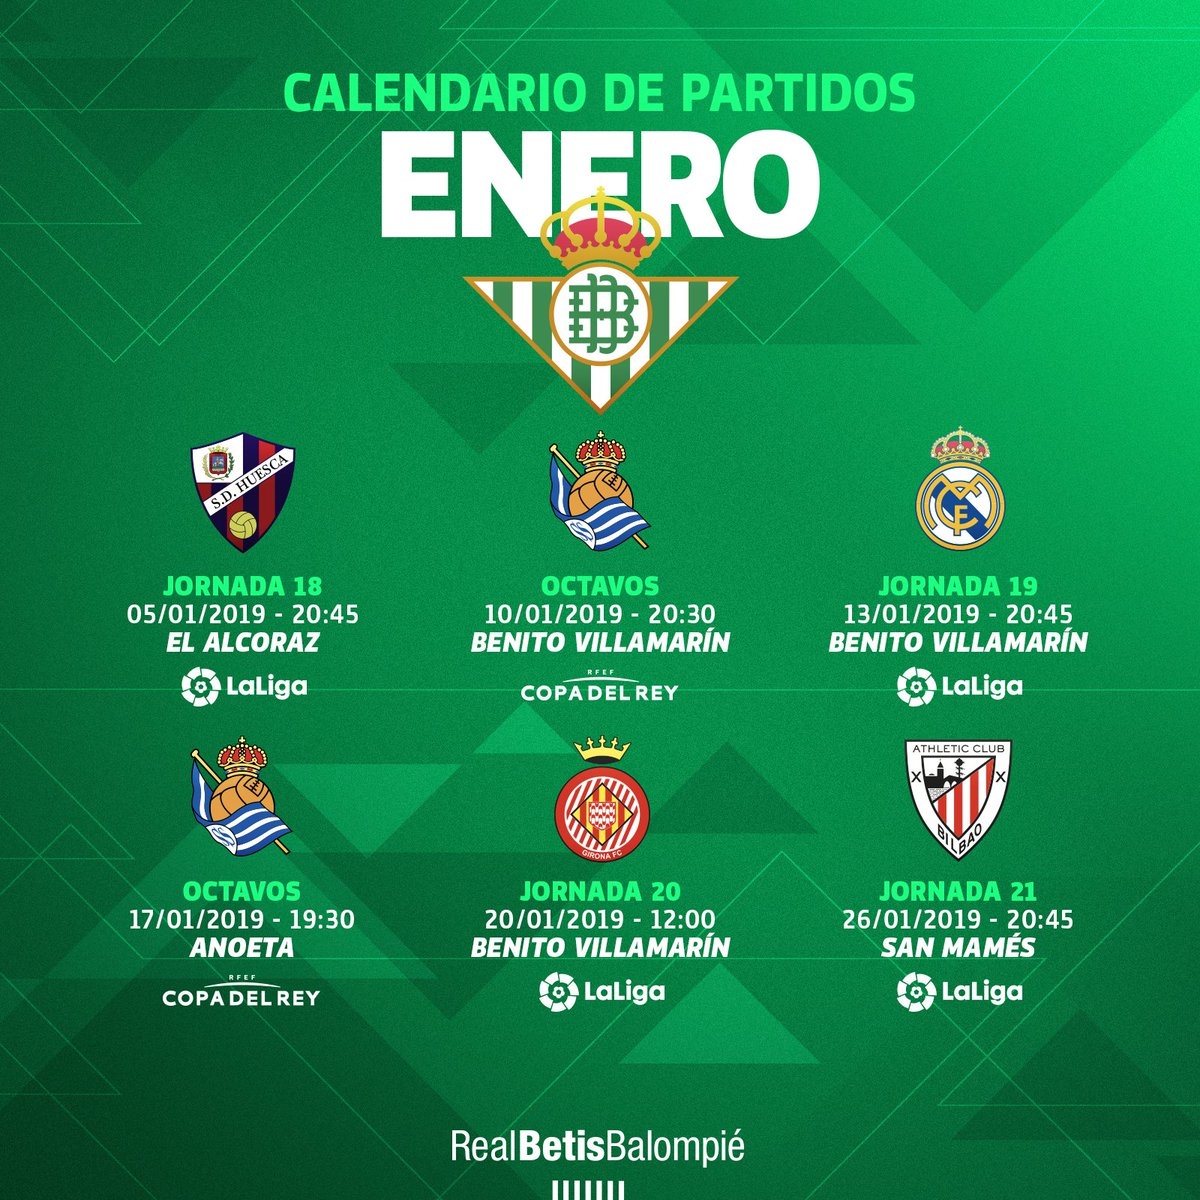 Calendario Liga Santander 2019 20 Betis.Calendario Del Real Betis